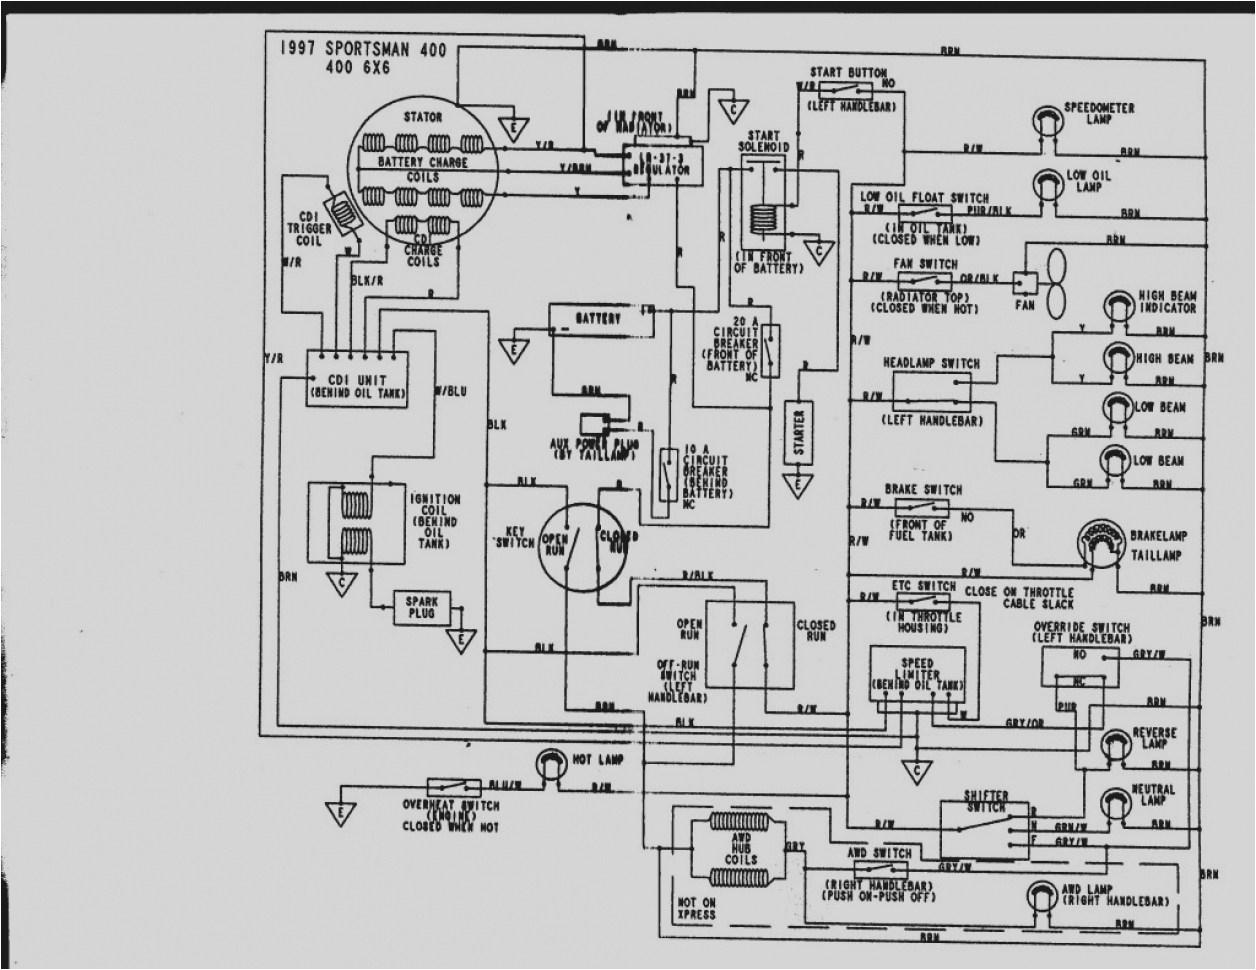 polaris wiring schematic wiring diagram database wiring diagram polaris sportsman 400 polaris electrical diagram wiring diagram